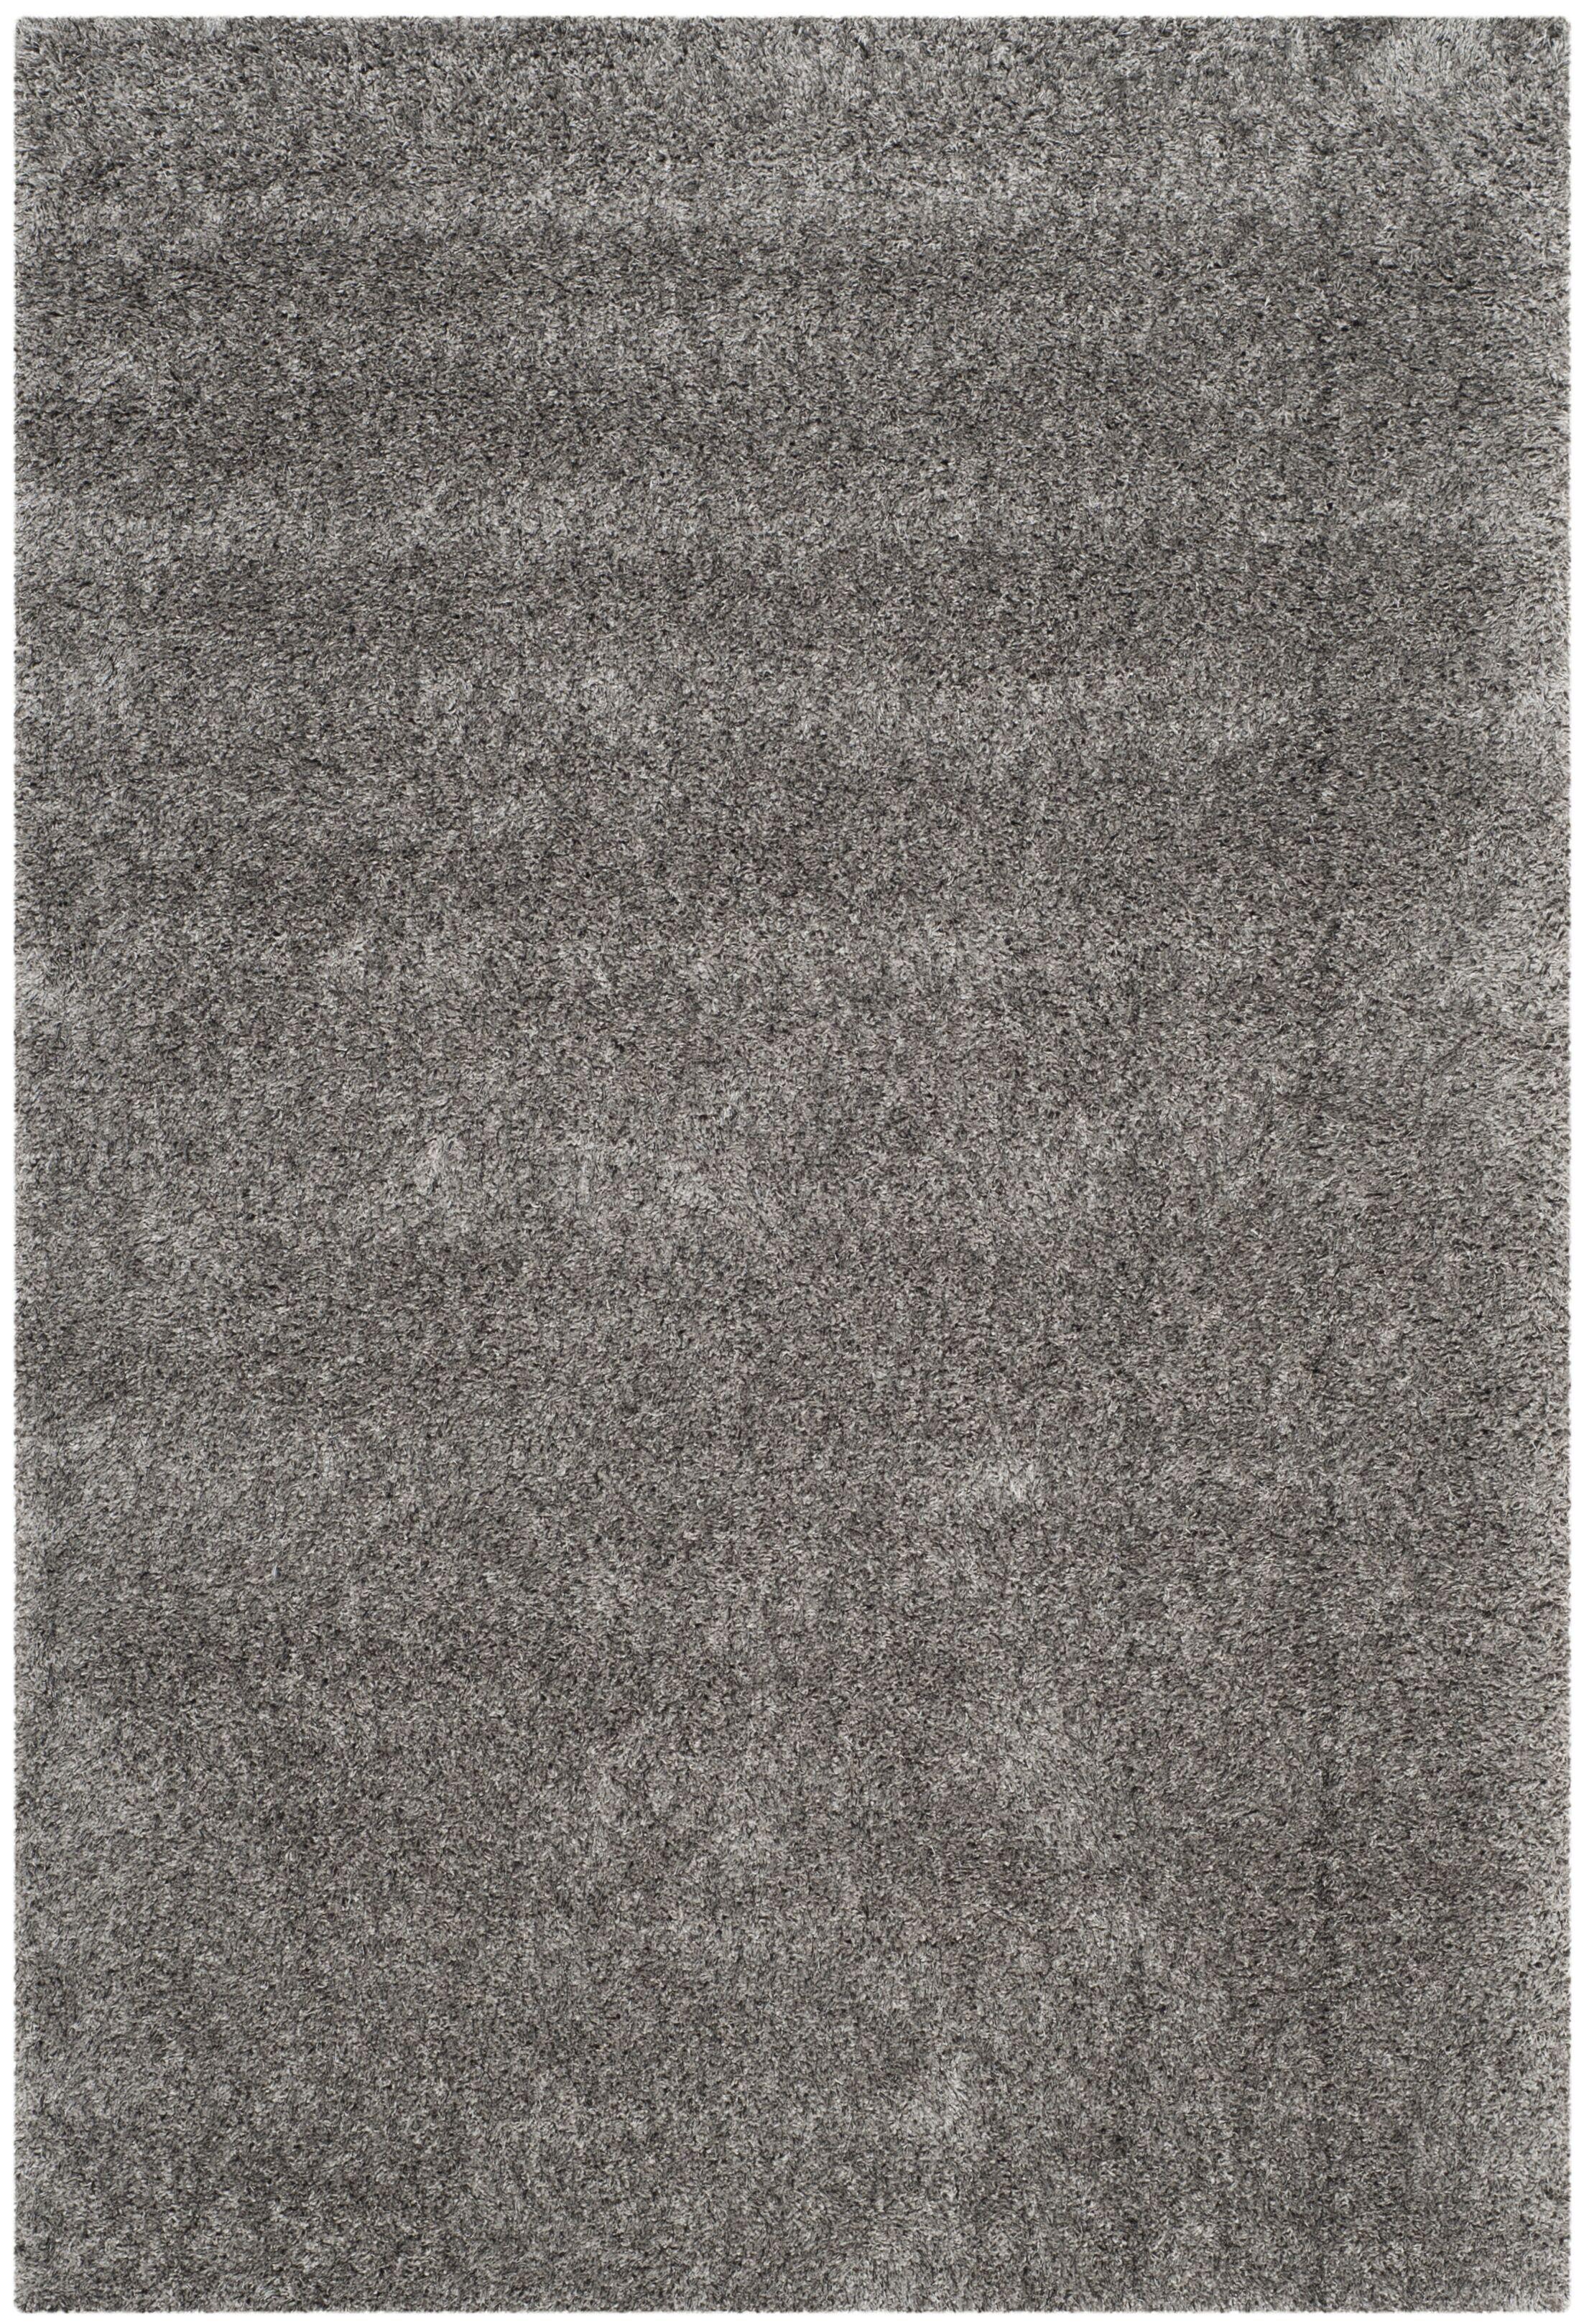 Soraya  Gray Area Rug Rug Size: Square 4'